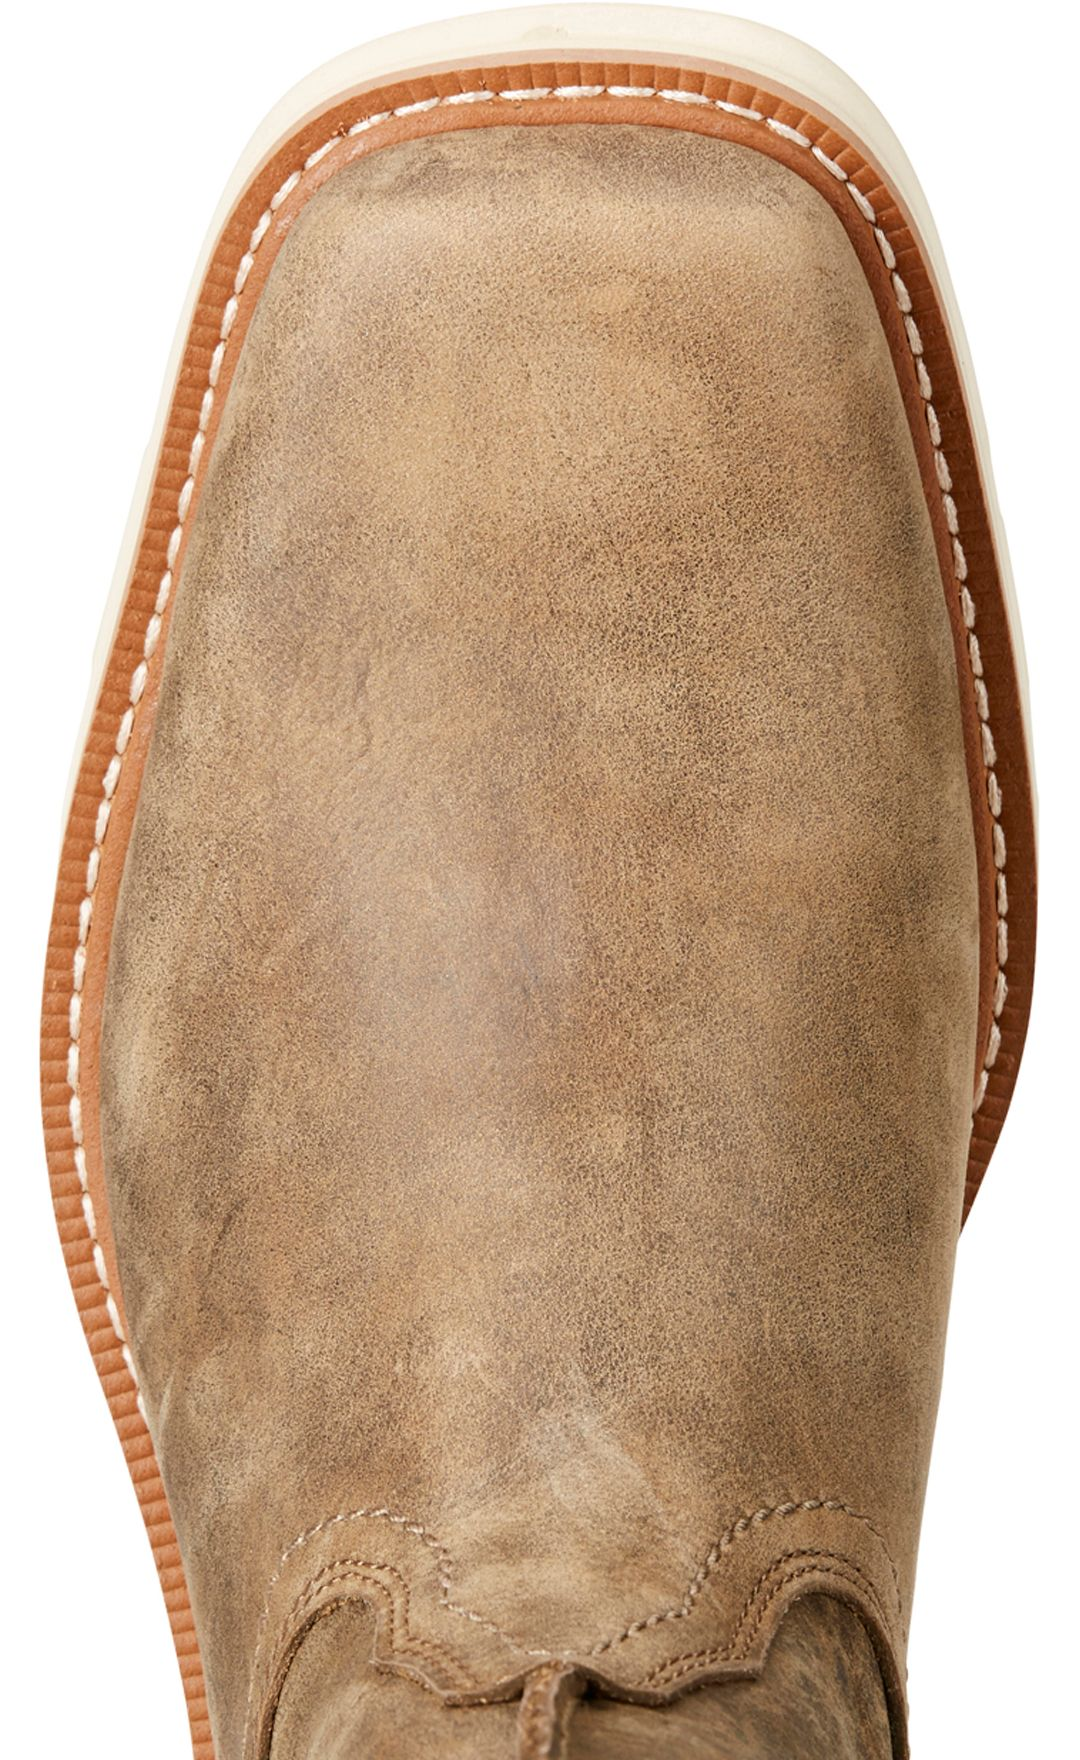 186941a4725 Ariat Men's Rambler Recon Work Boots